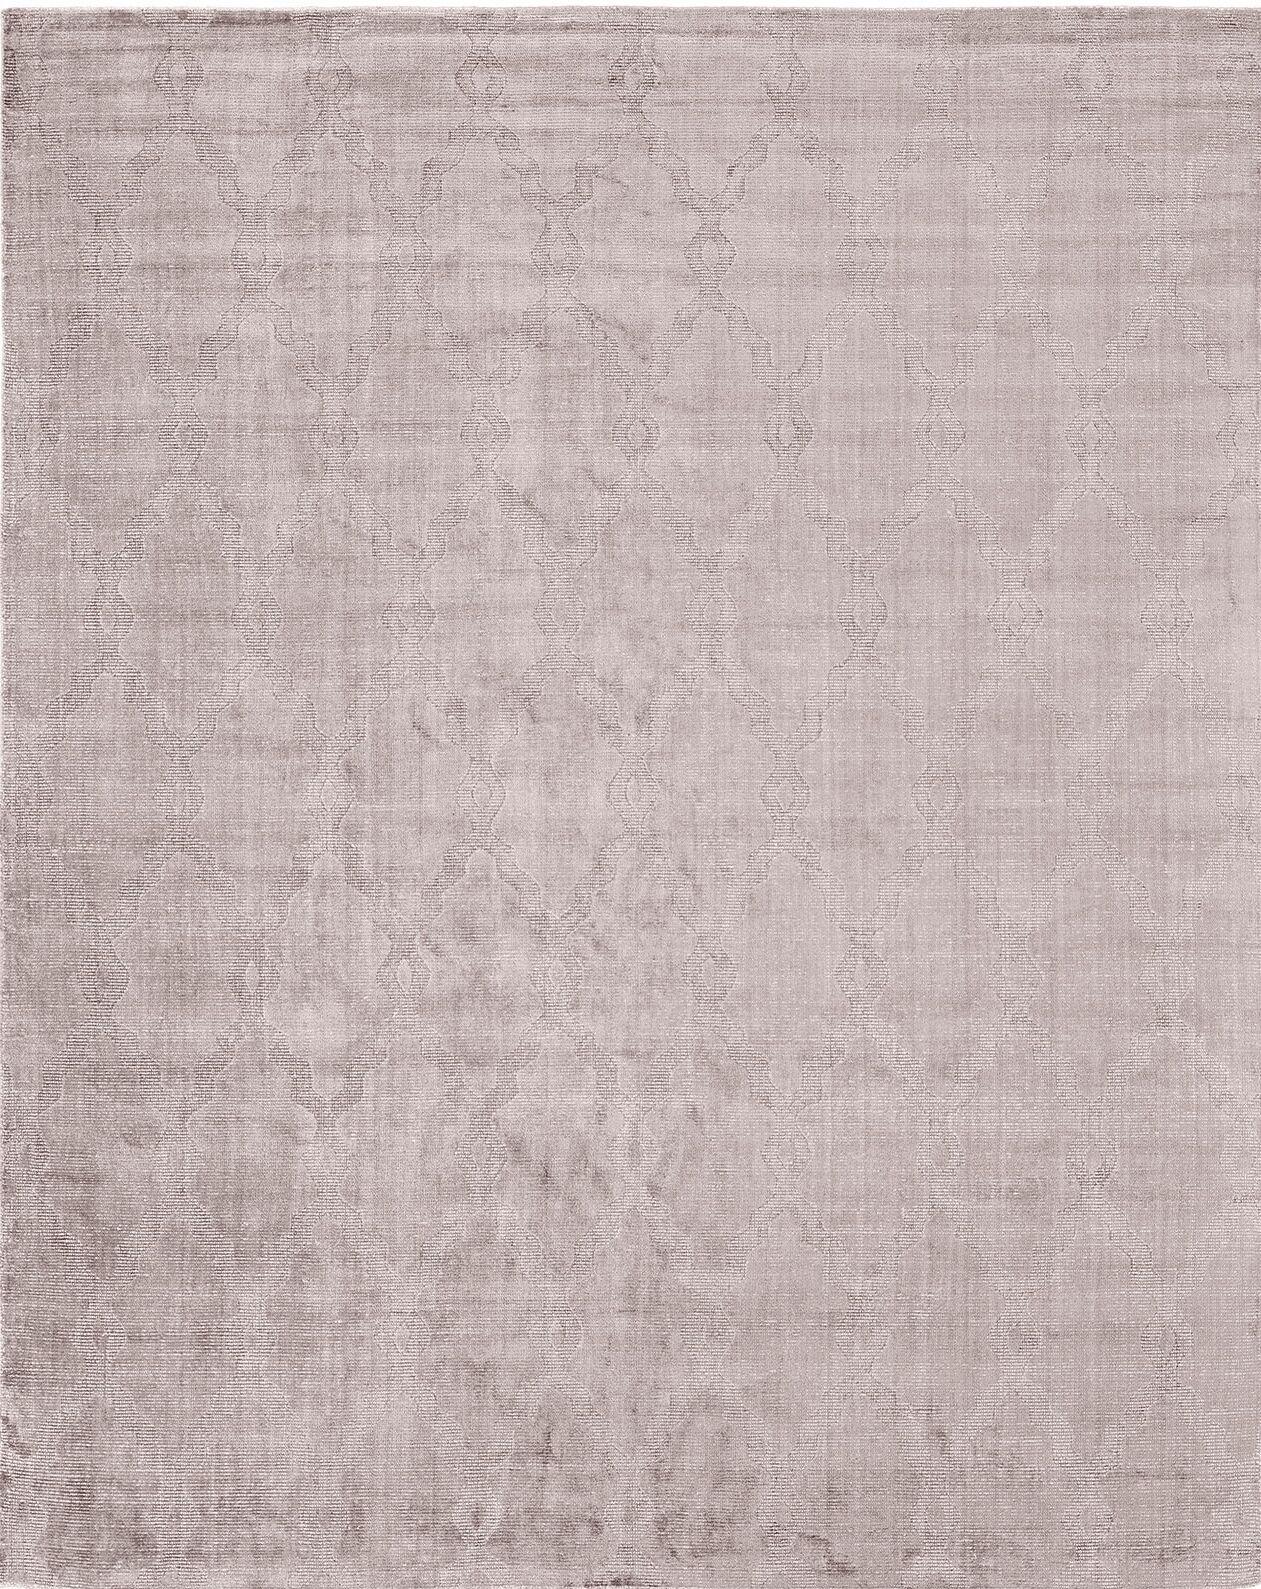 Handmade Purple Area Rug Rug Size: Runner 2'6